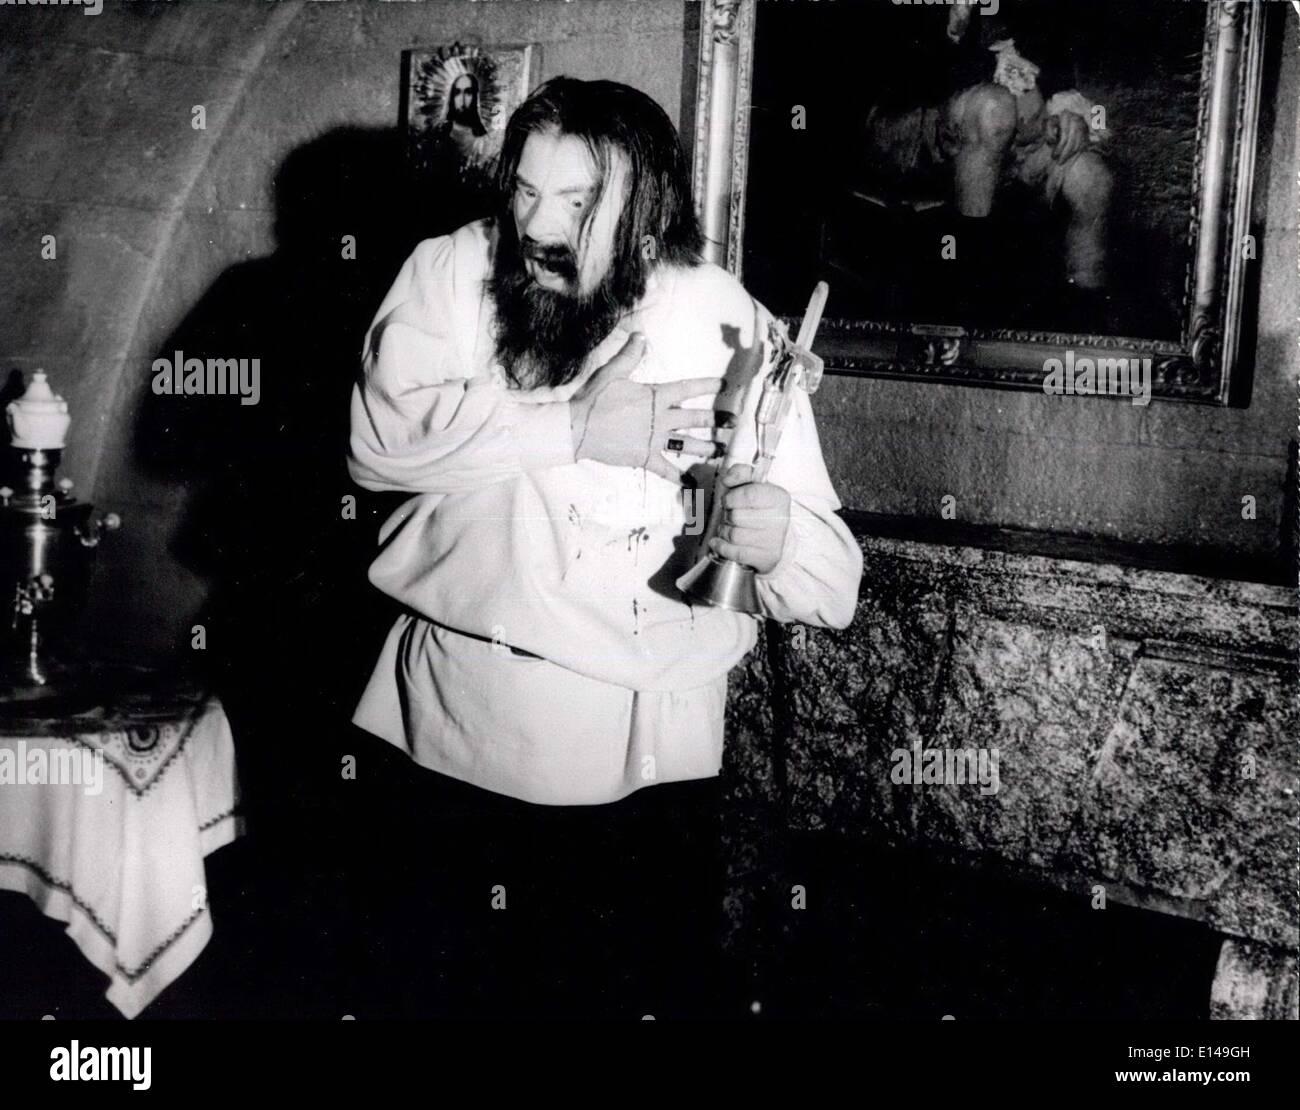 Apr. 17, 2012 - Rasputin Played by Gert Froebe - Stock Image